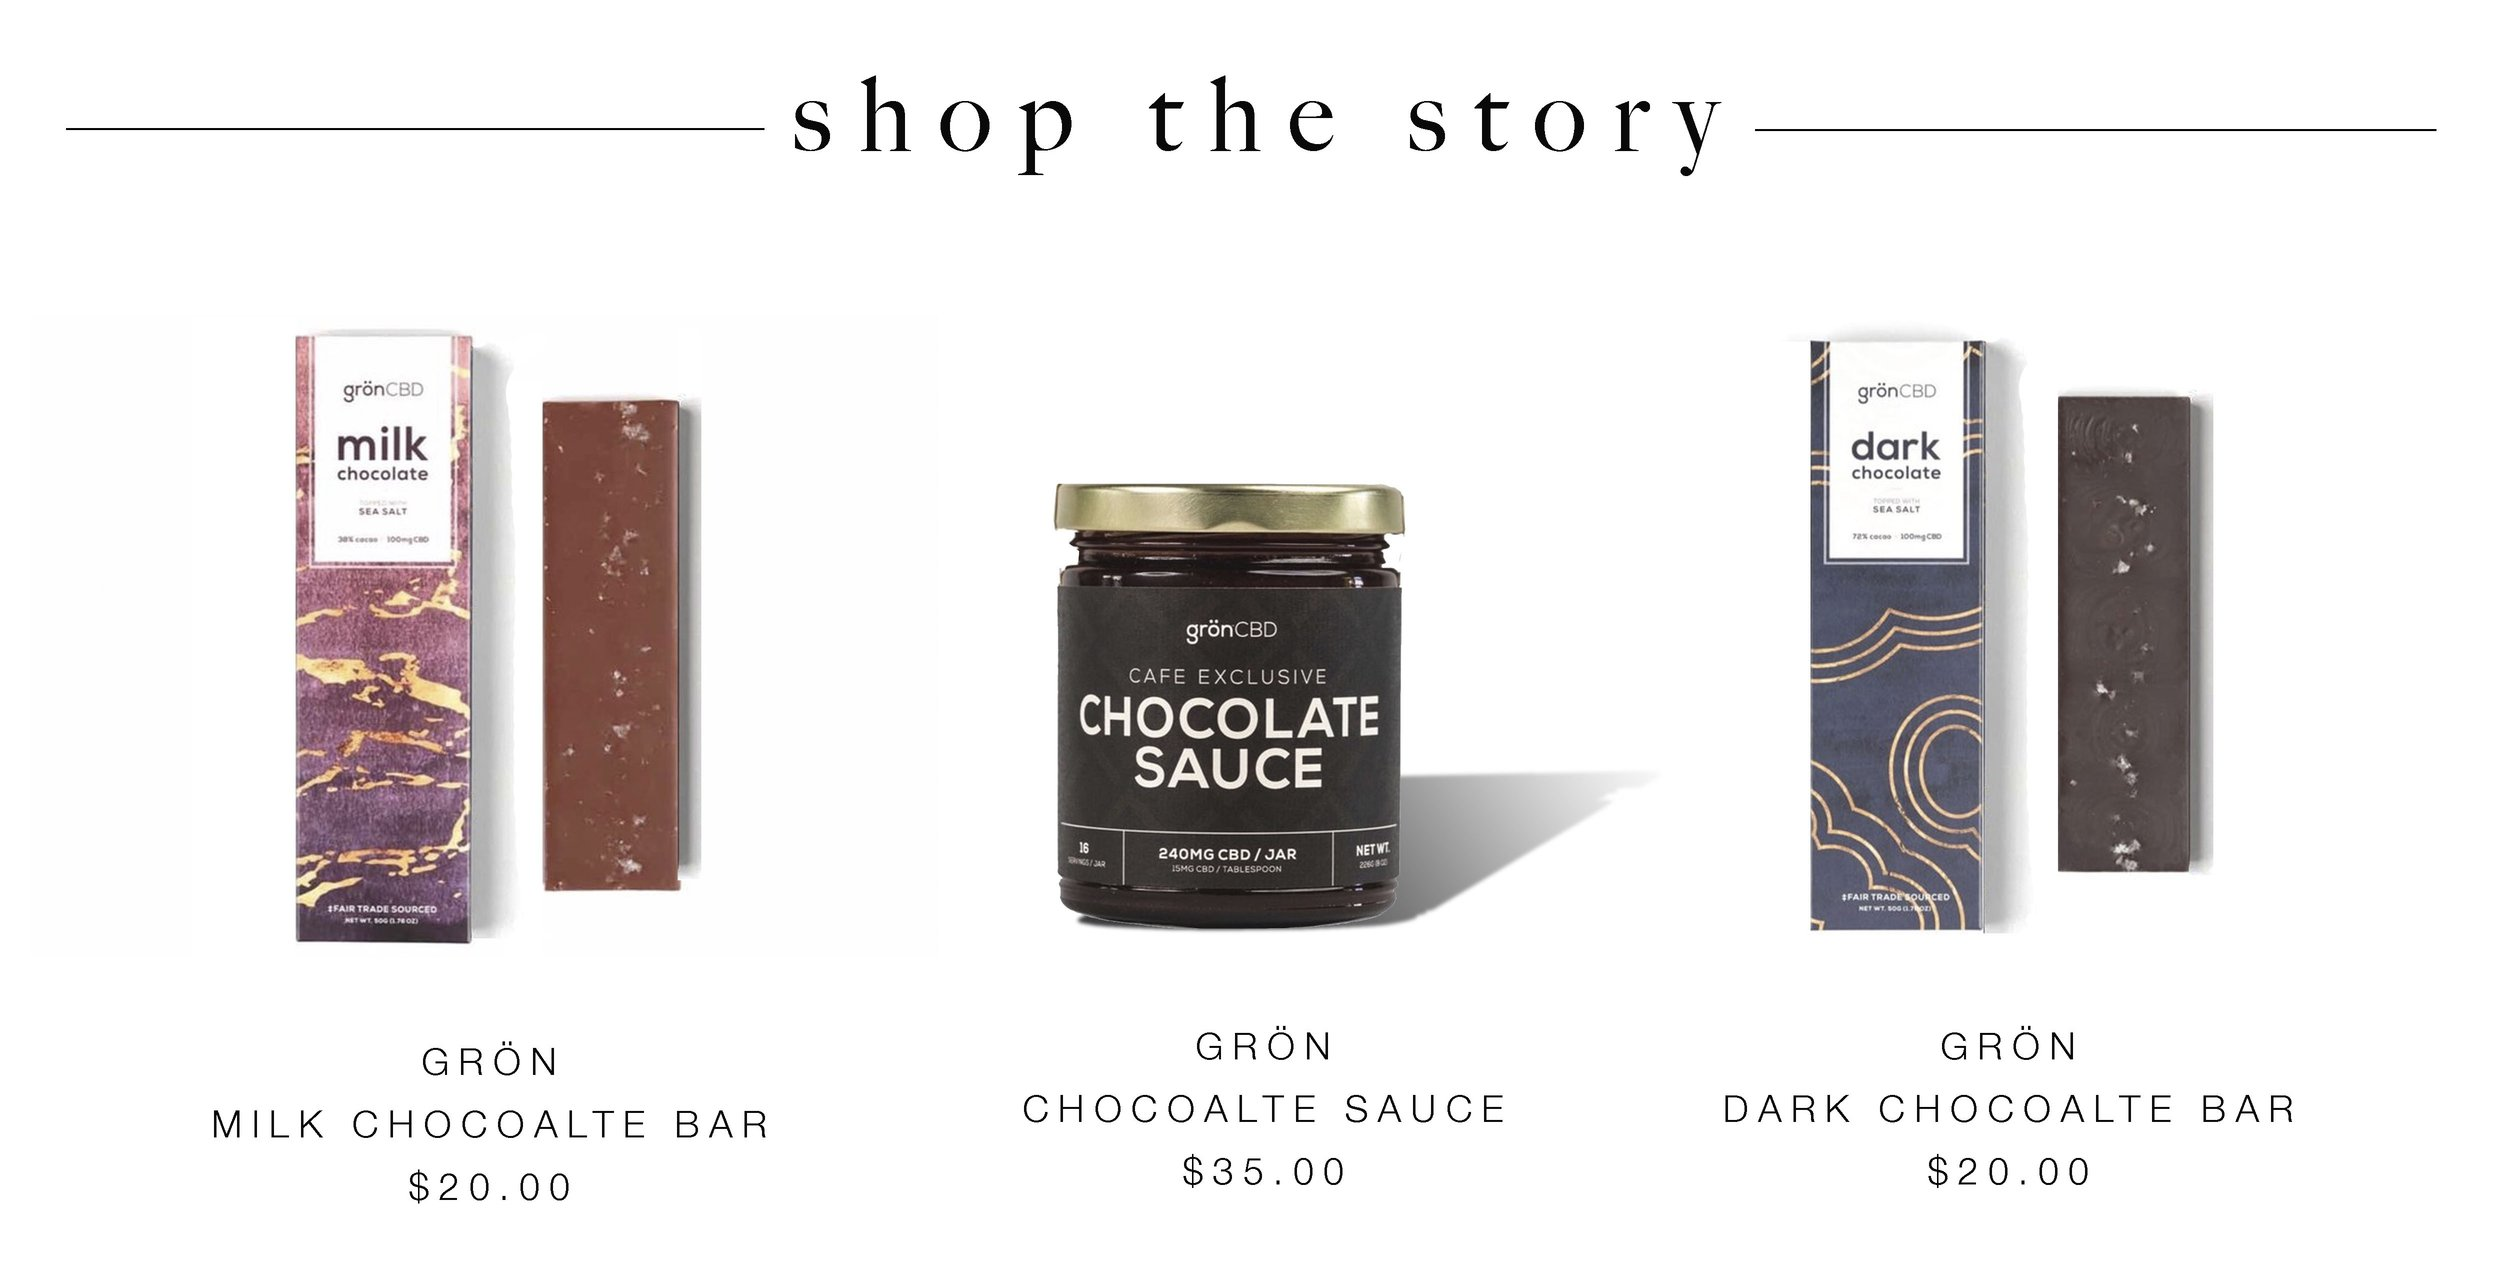 shop the story gron.jpg